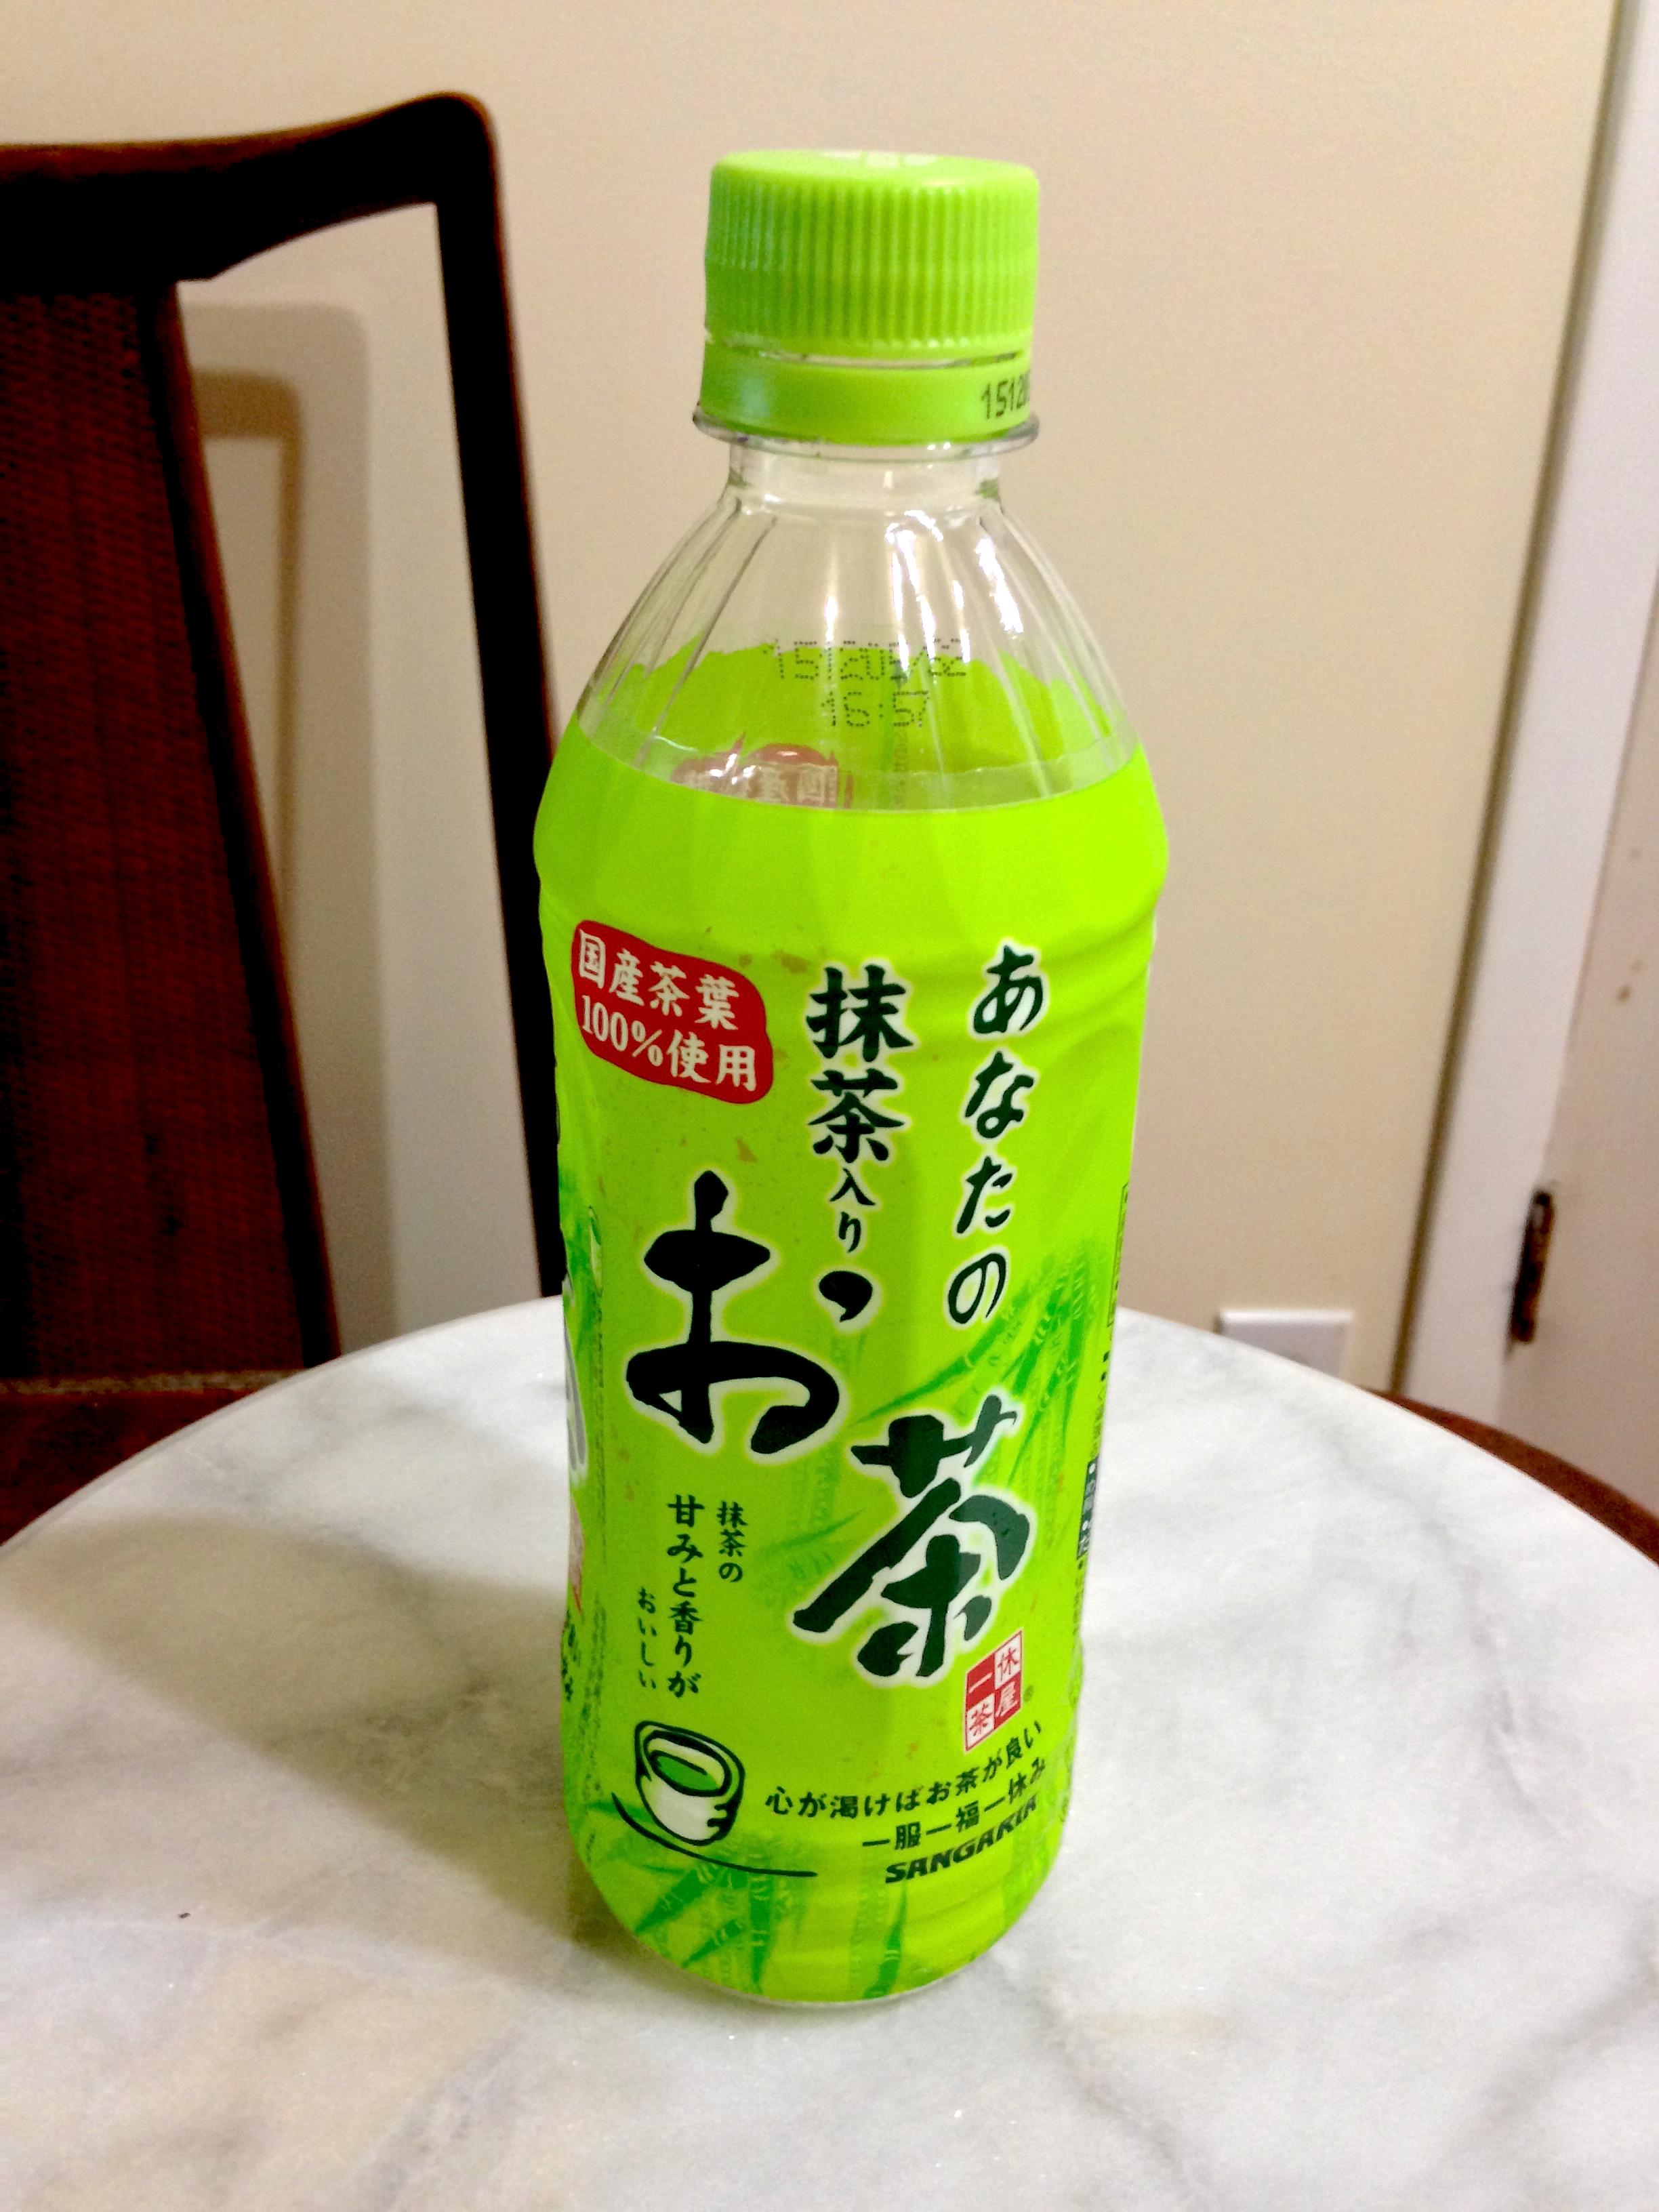 Macchairi bottle by Jocilyn Mors is licensed under a Creative Commons Attribution-ShareAlike 4.0 International License.